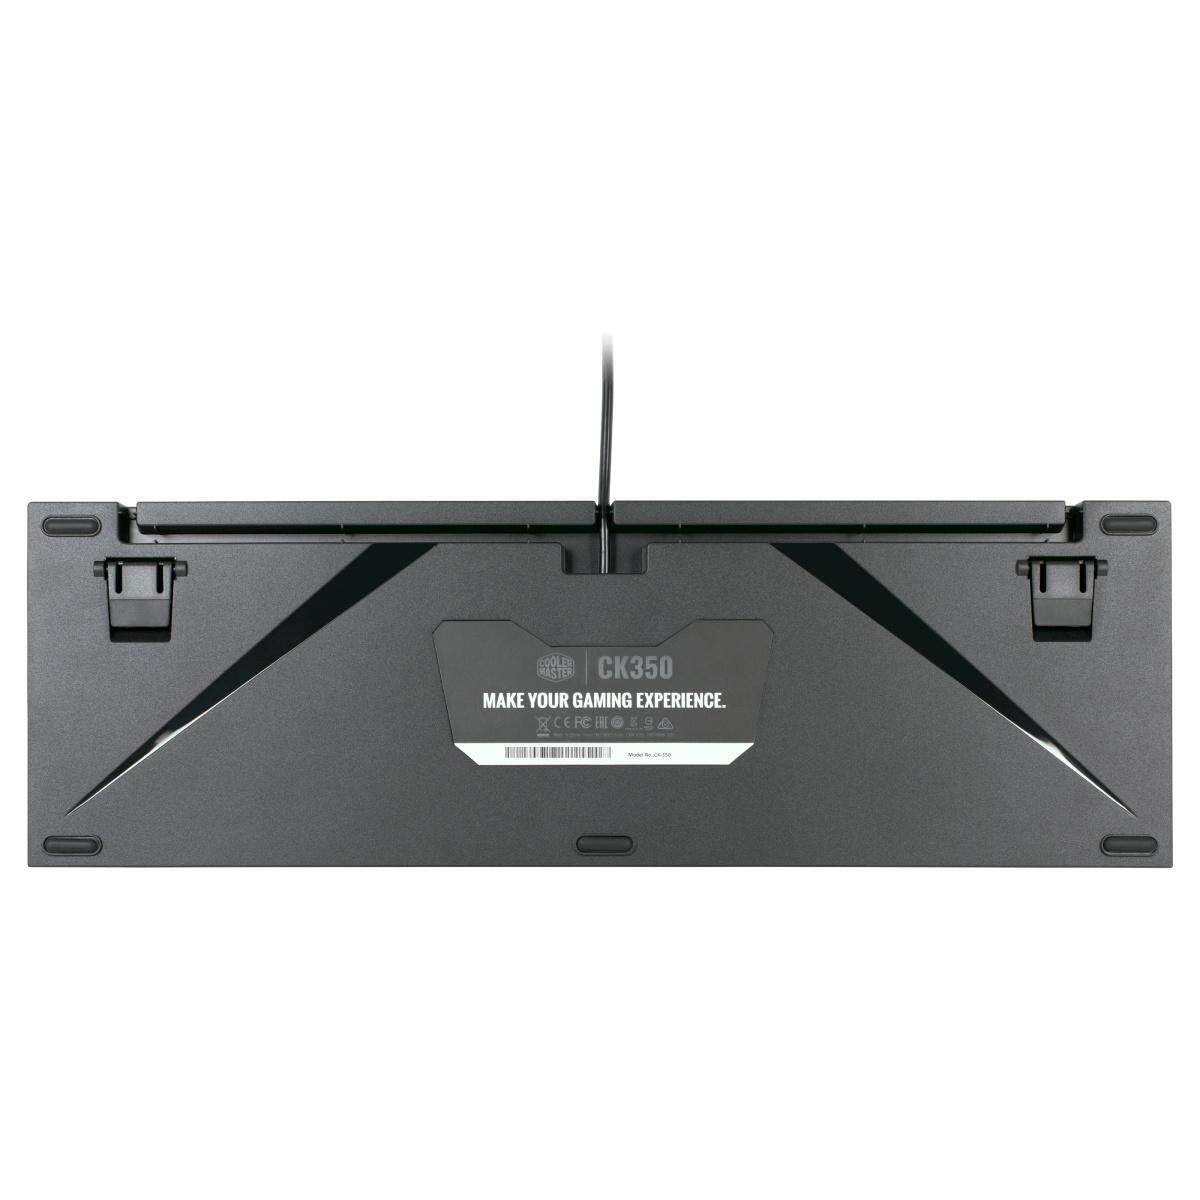 Cooler Master CK350 RGB Mechanical Gaming Keyboard with Brushed Aluminum Design (Full Layout / 108 Keys)